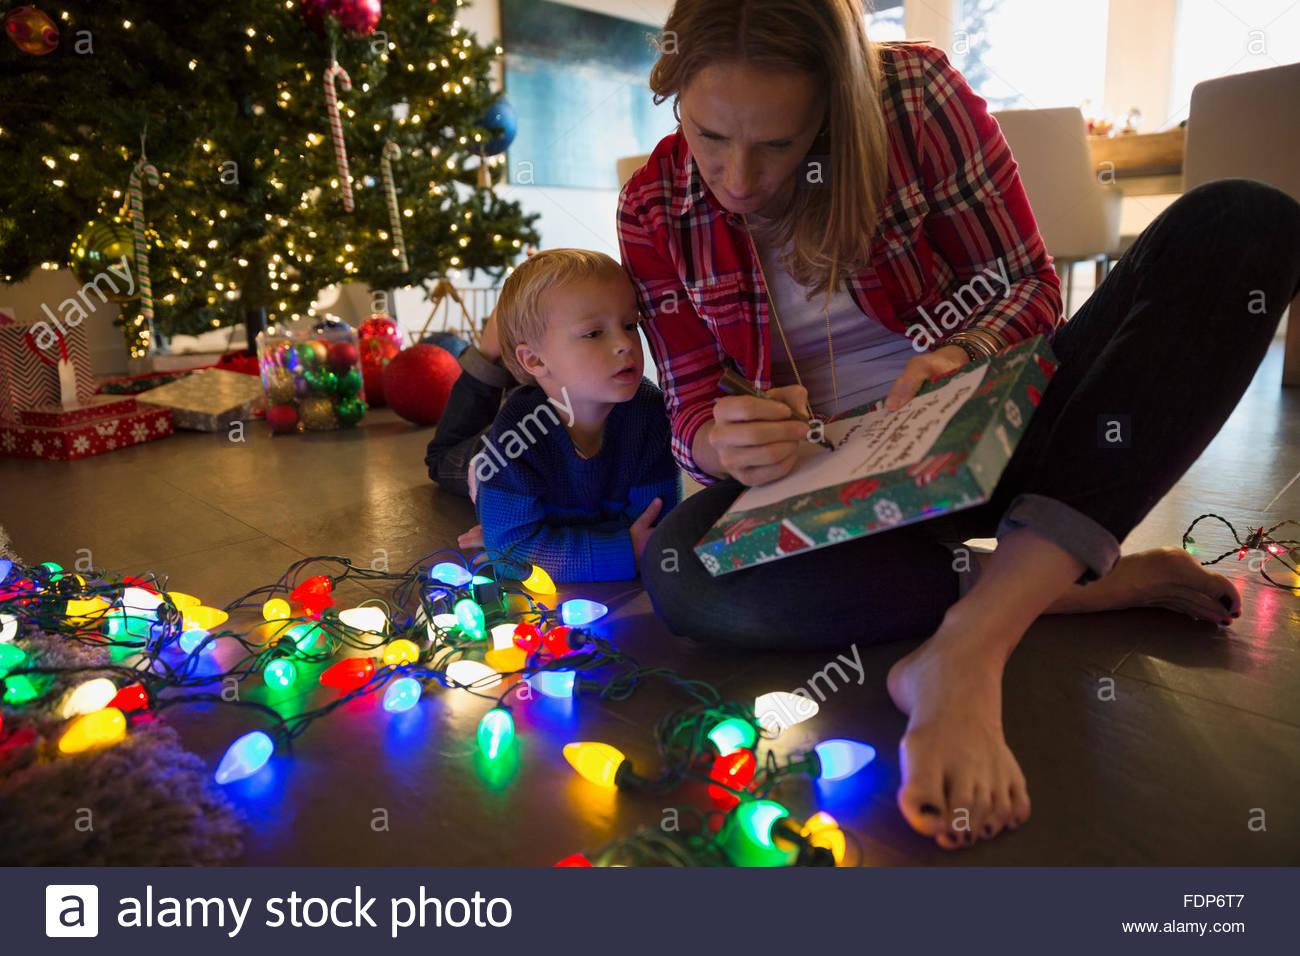 Madre e hijo haciendo lista navidad luces de cadena Imagen De Stock